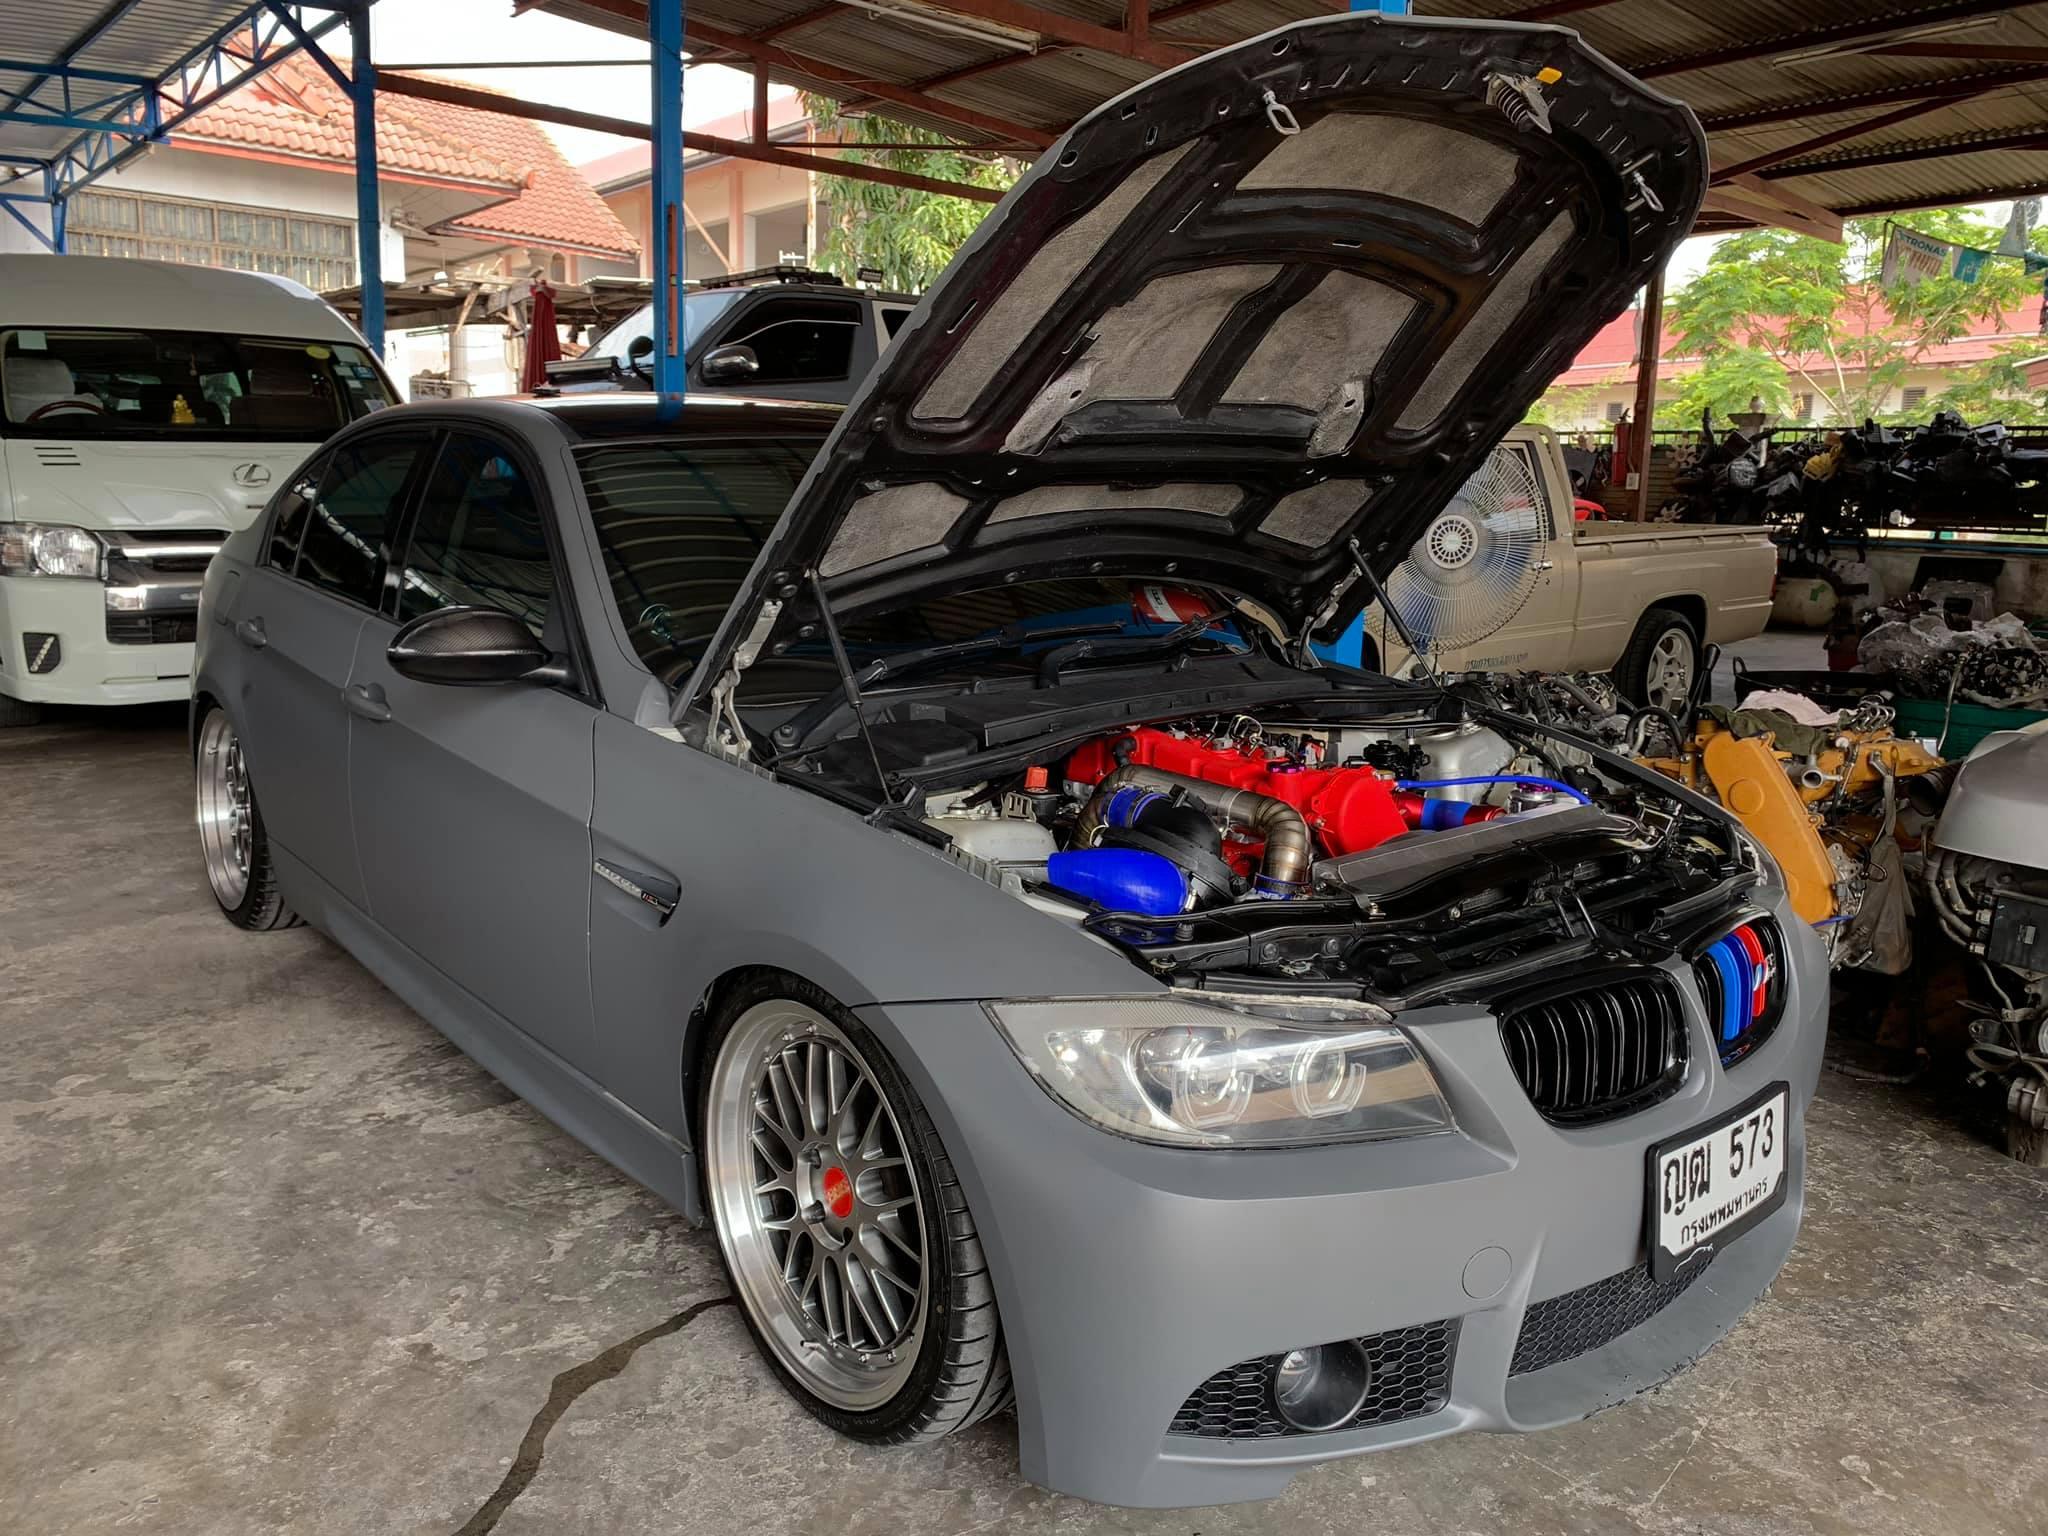 BMW E90 with a Toyota 1KD Turbo Diesel Inline-Four – Engine Swap Depot